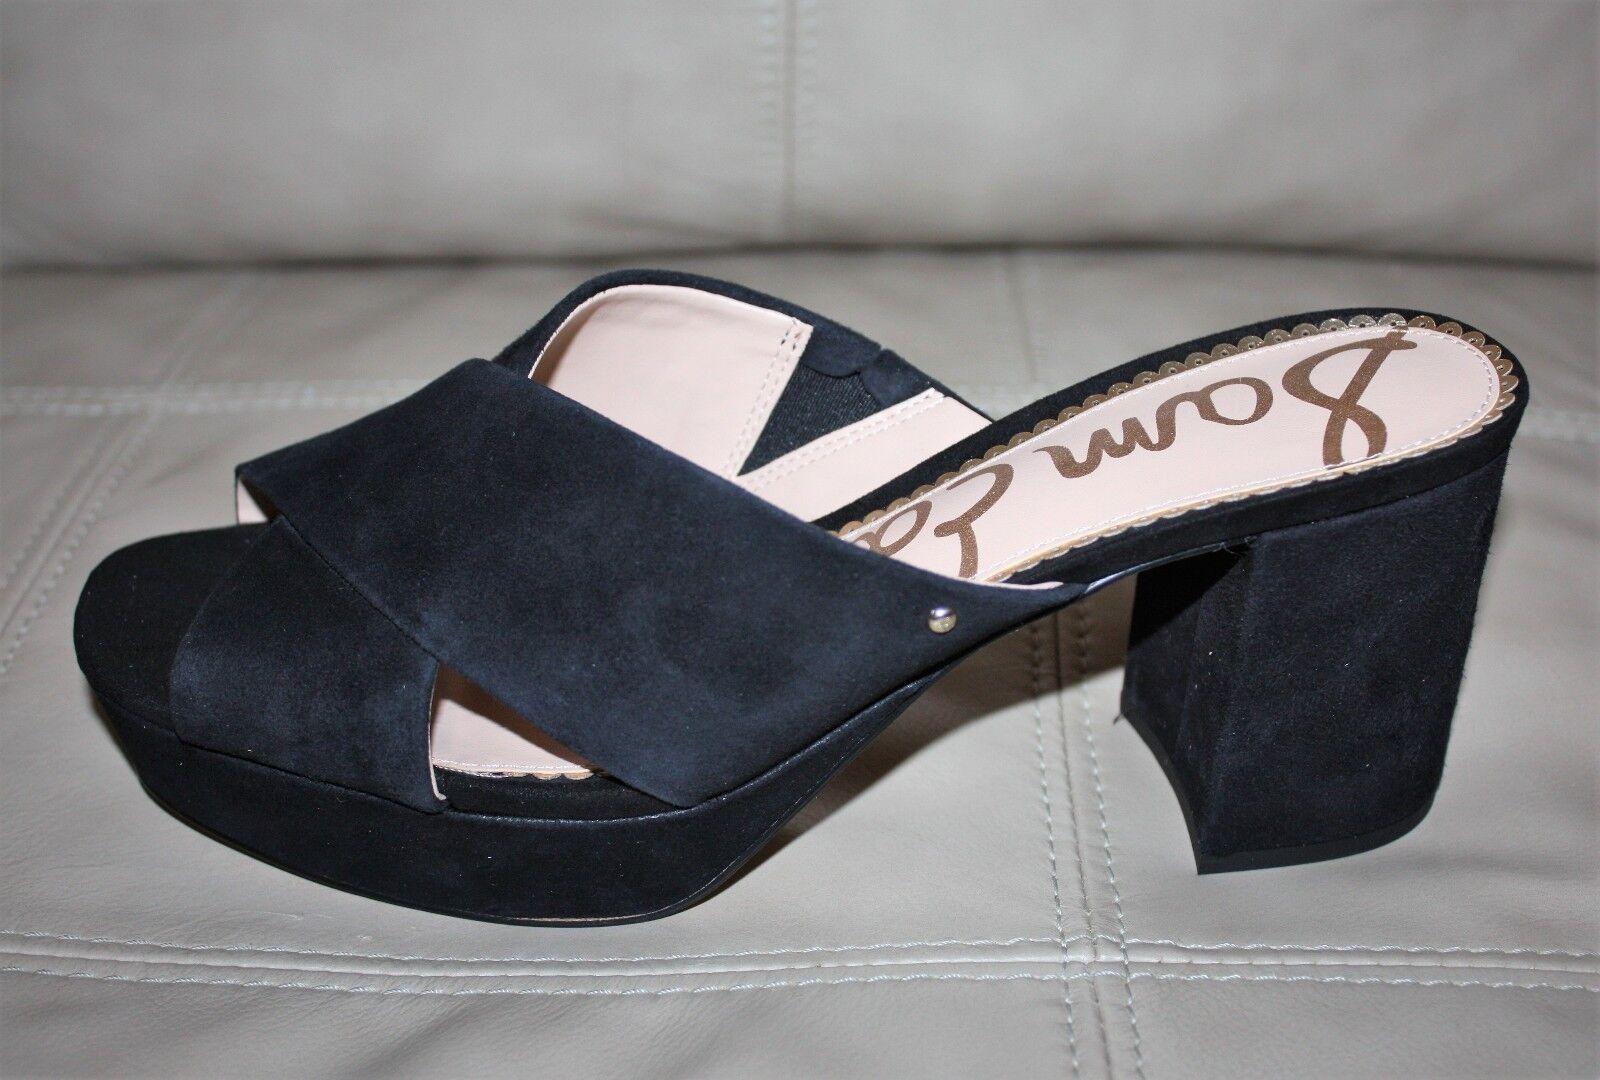 bcede1ba8fa6 Sam Edelman Jayne Crisscross Platform Slide Heeled Sandals Black ...